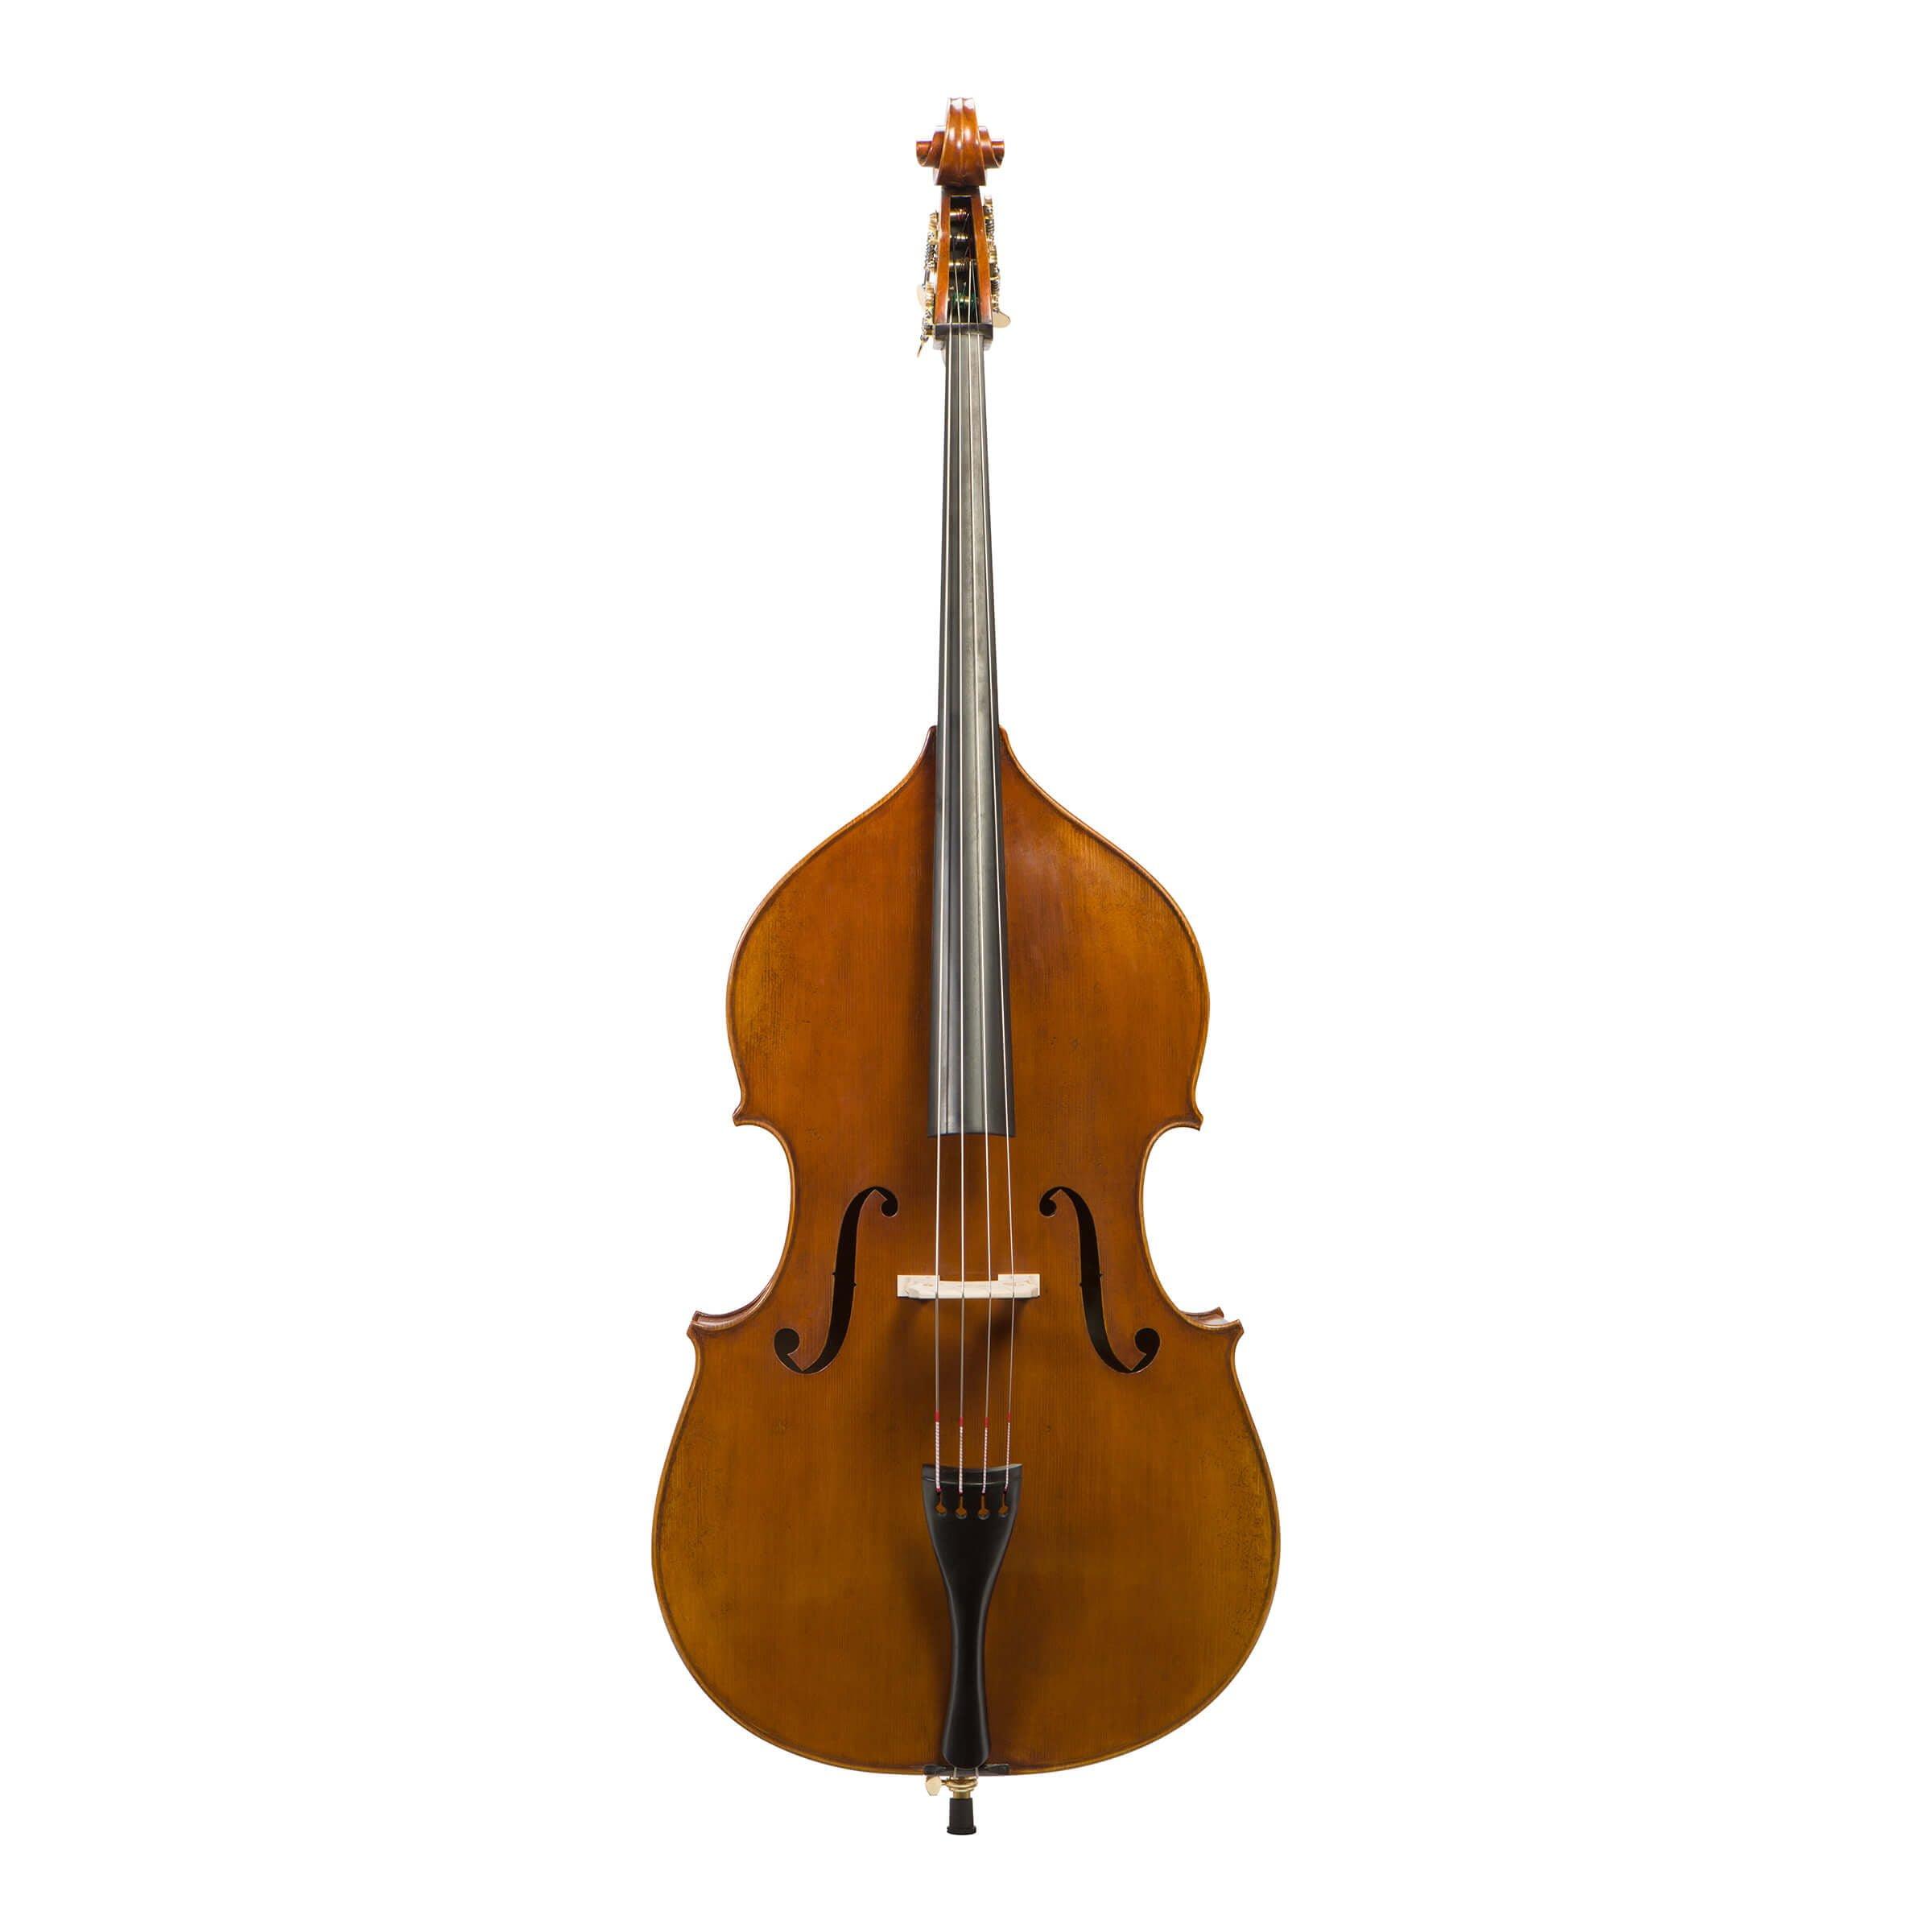 Eastman Pietro Lombardi VB502 Double Bass